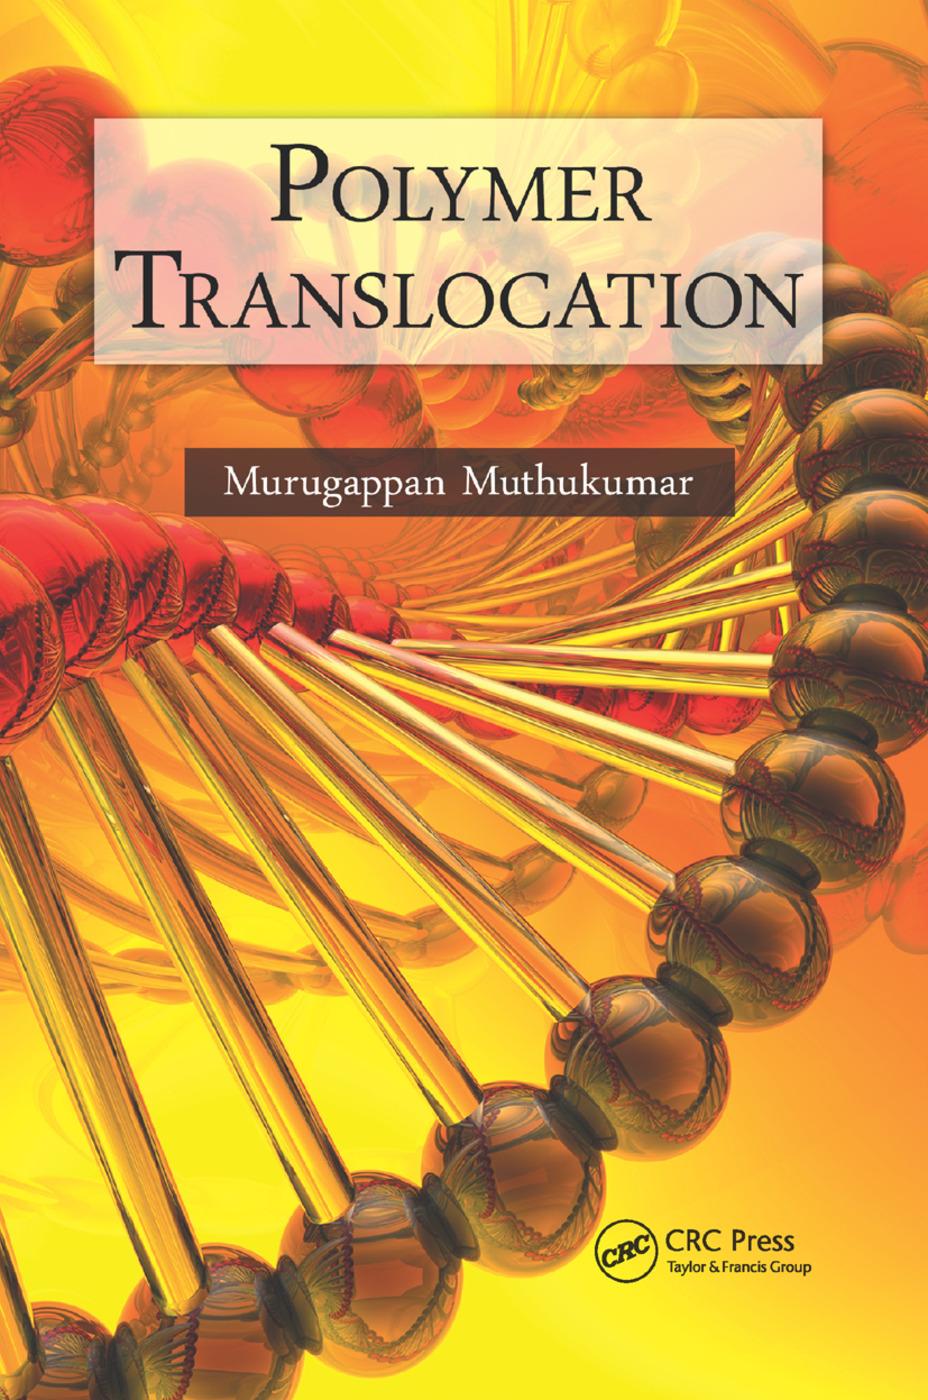 Polymer Translocation